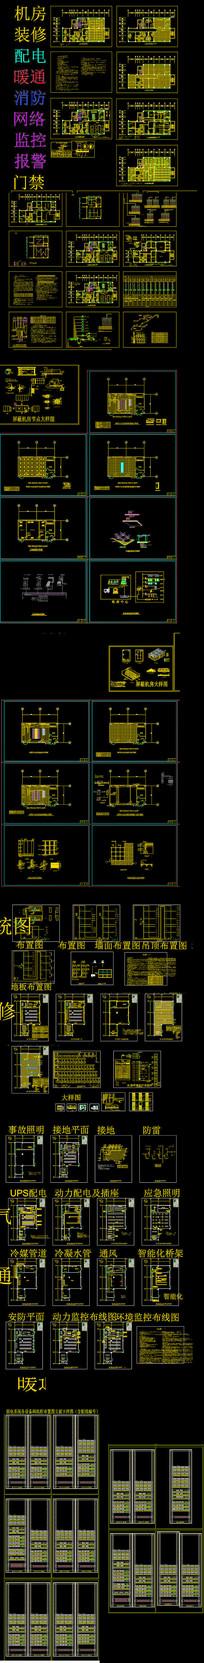 CAD弱电系统图